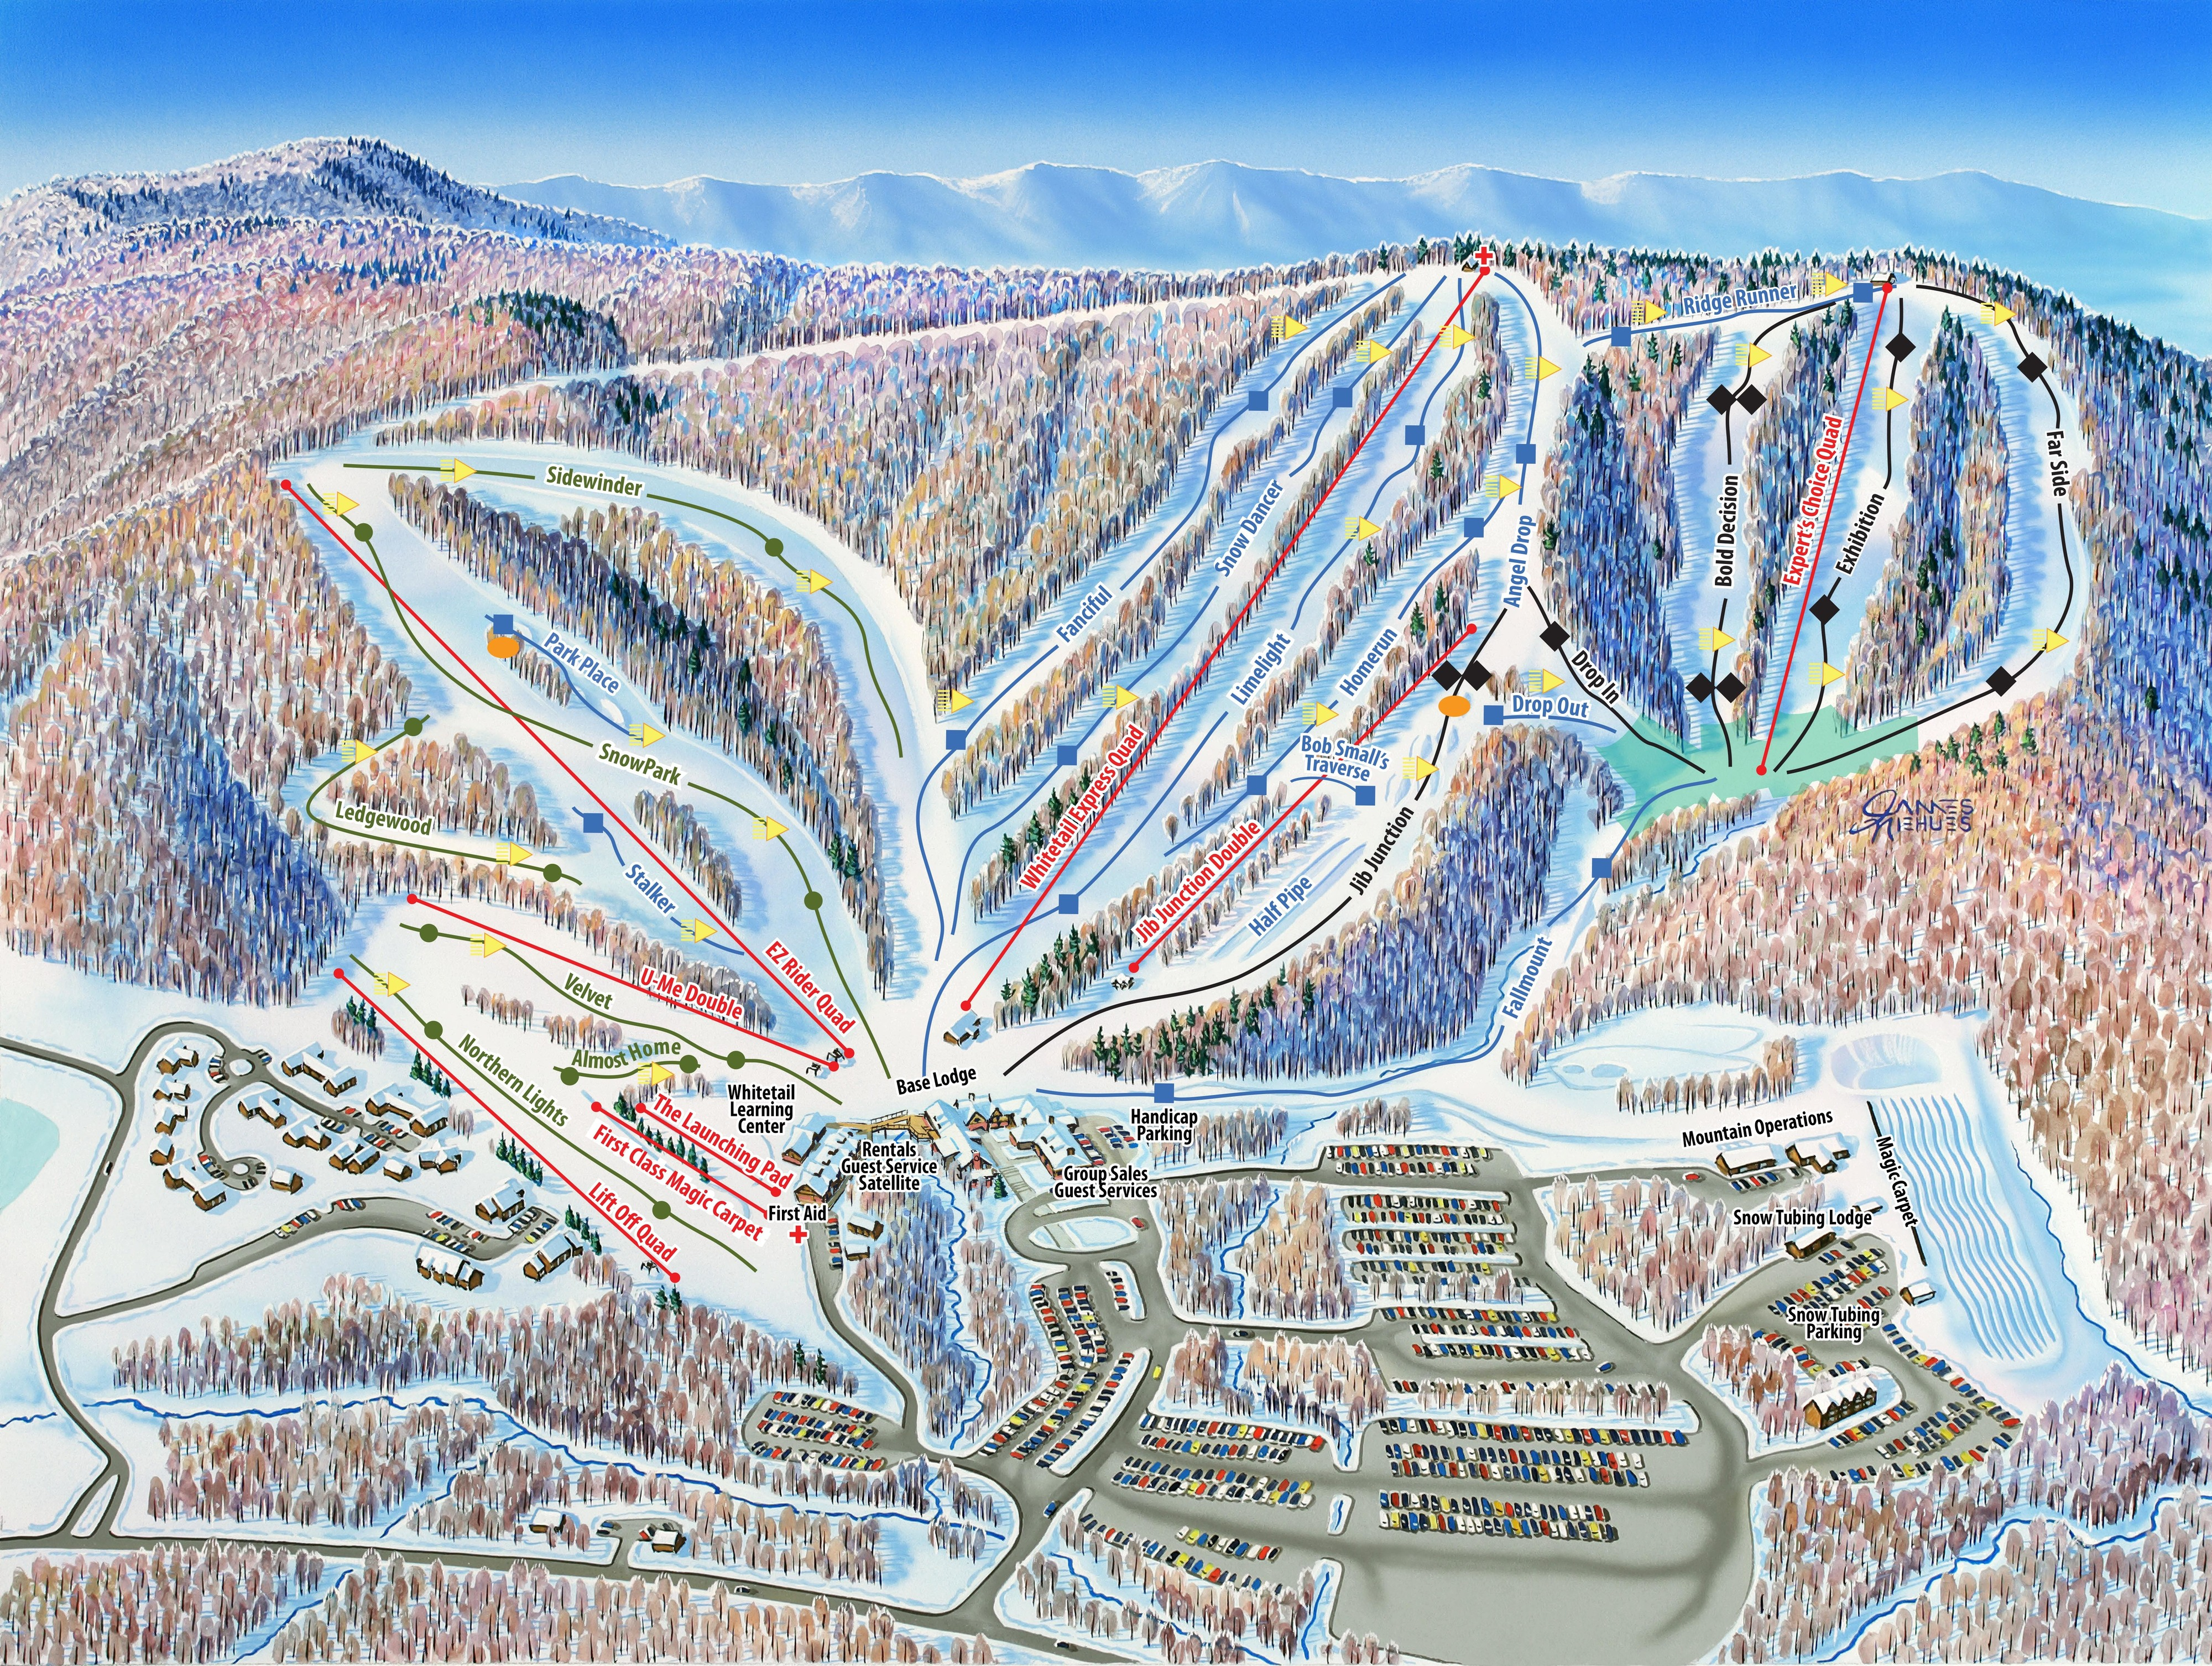 whitetail resort ski resort guide, location map & whitetail resort